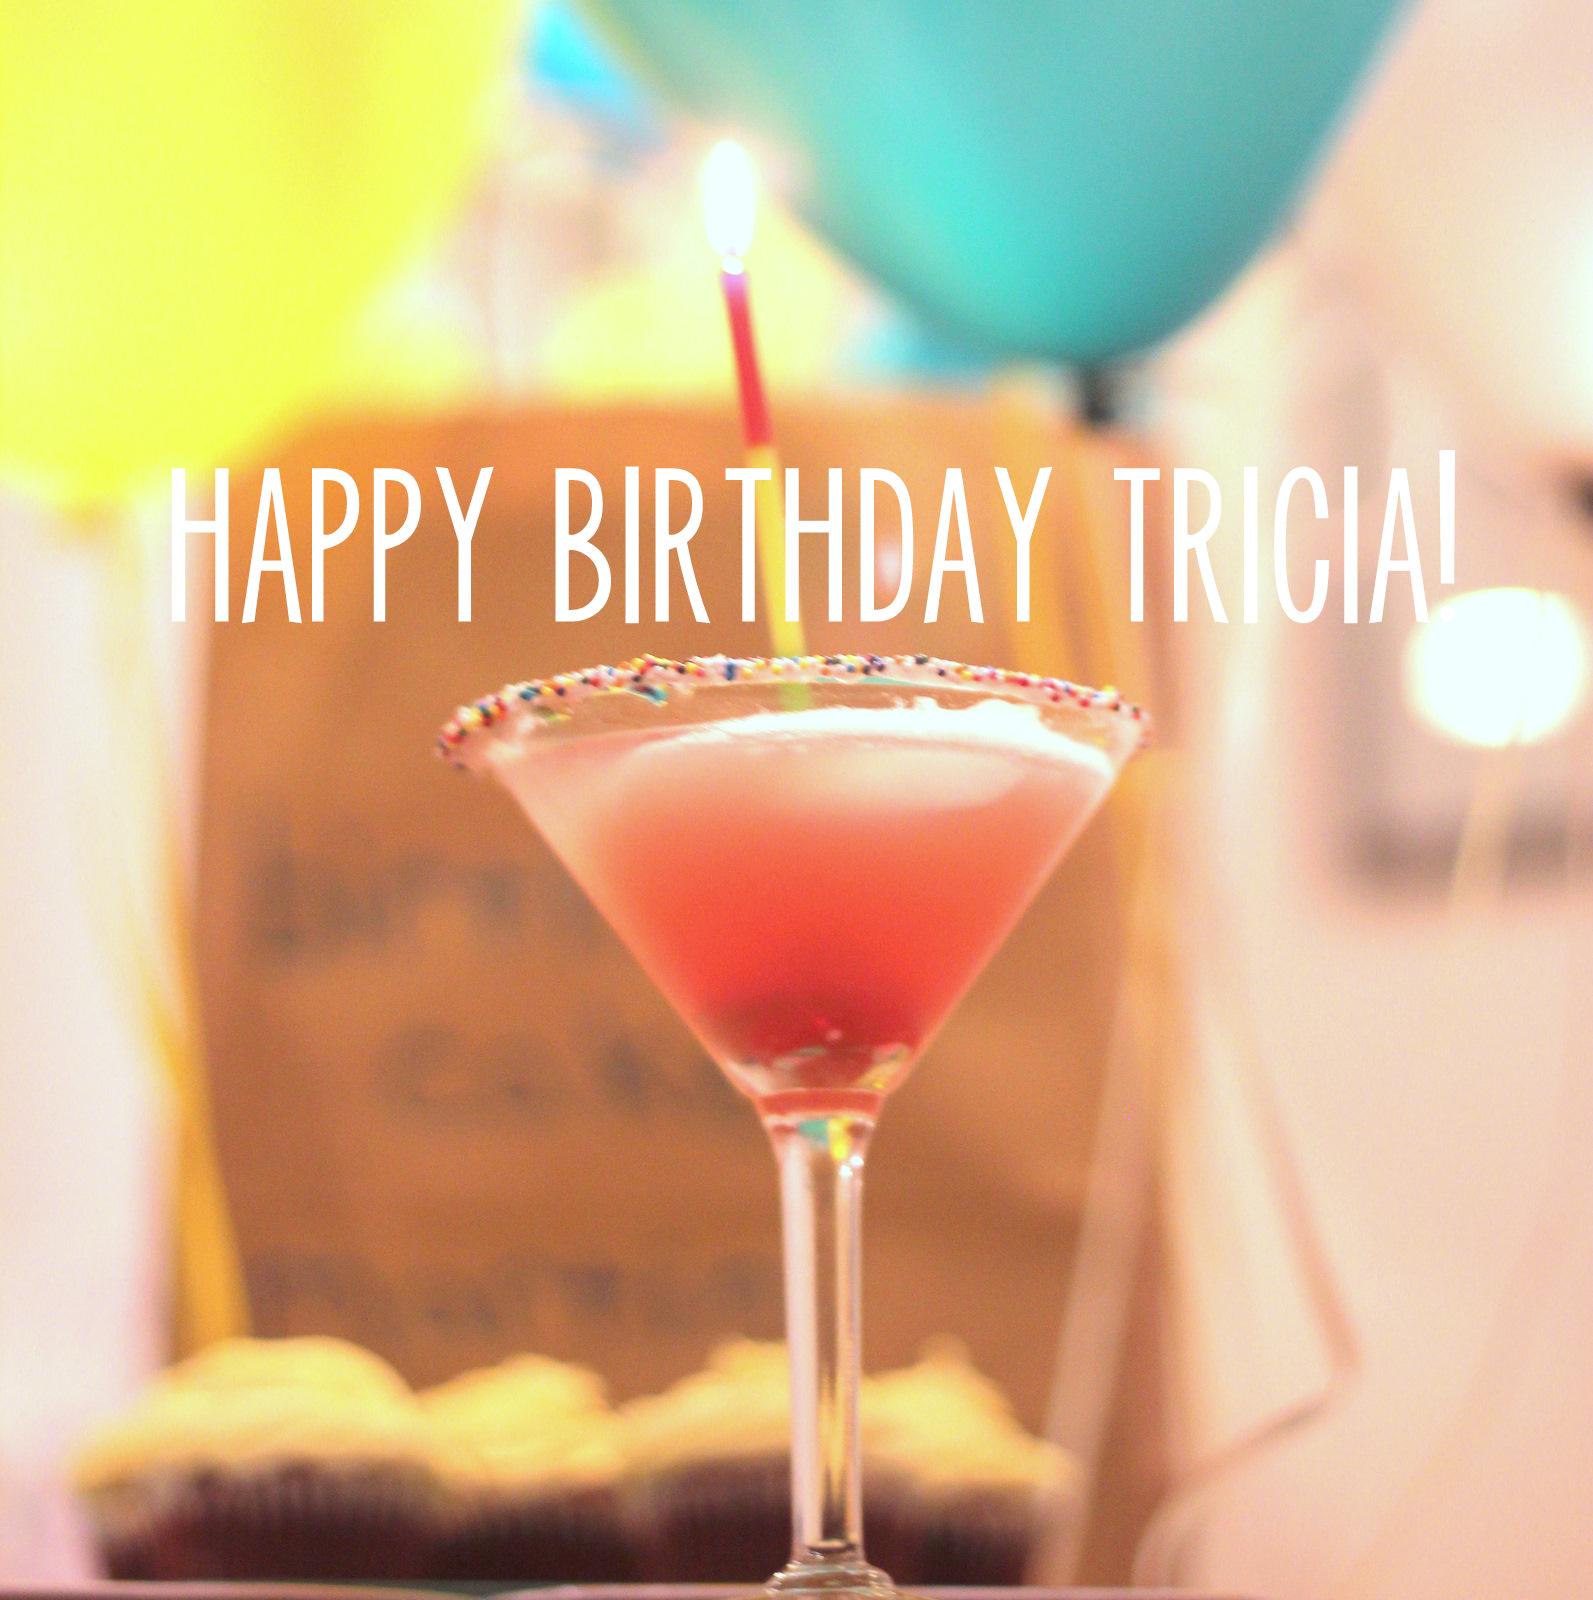 sips etc happy birthday tricia and a birthday cake martini recipe